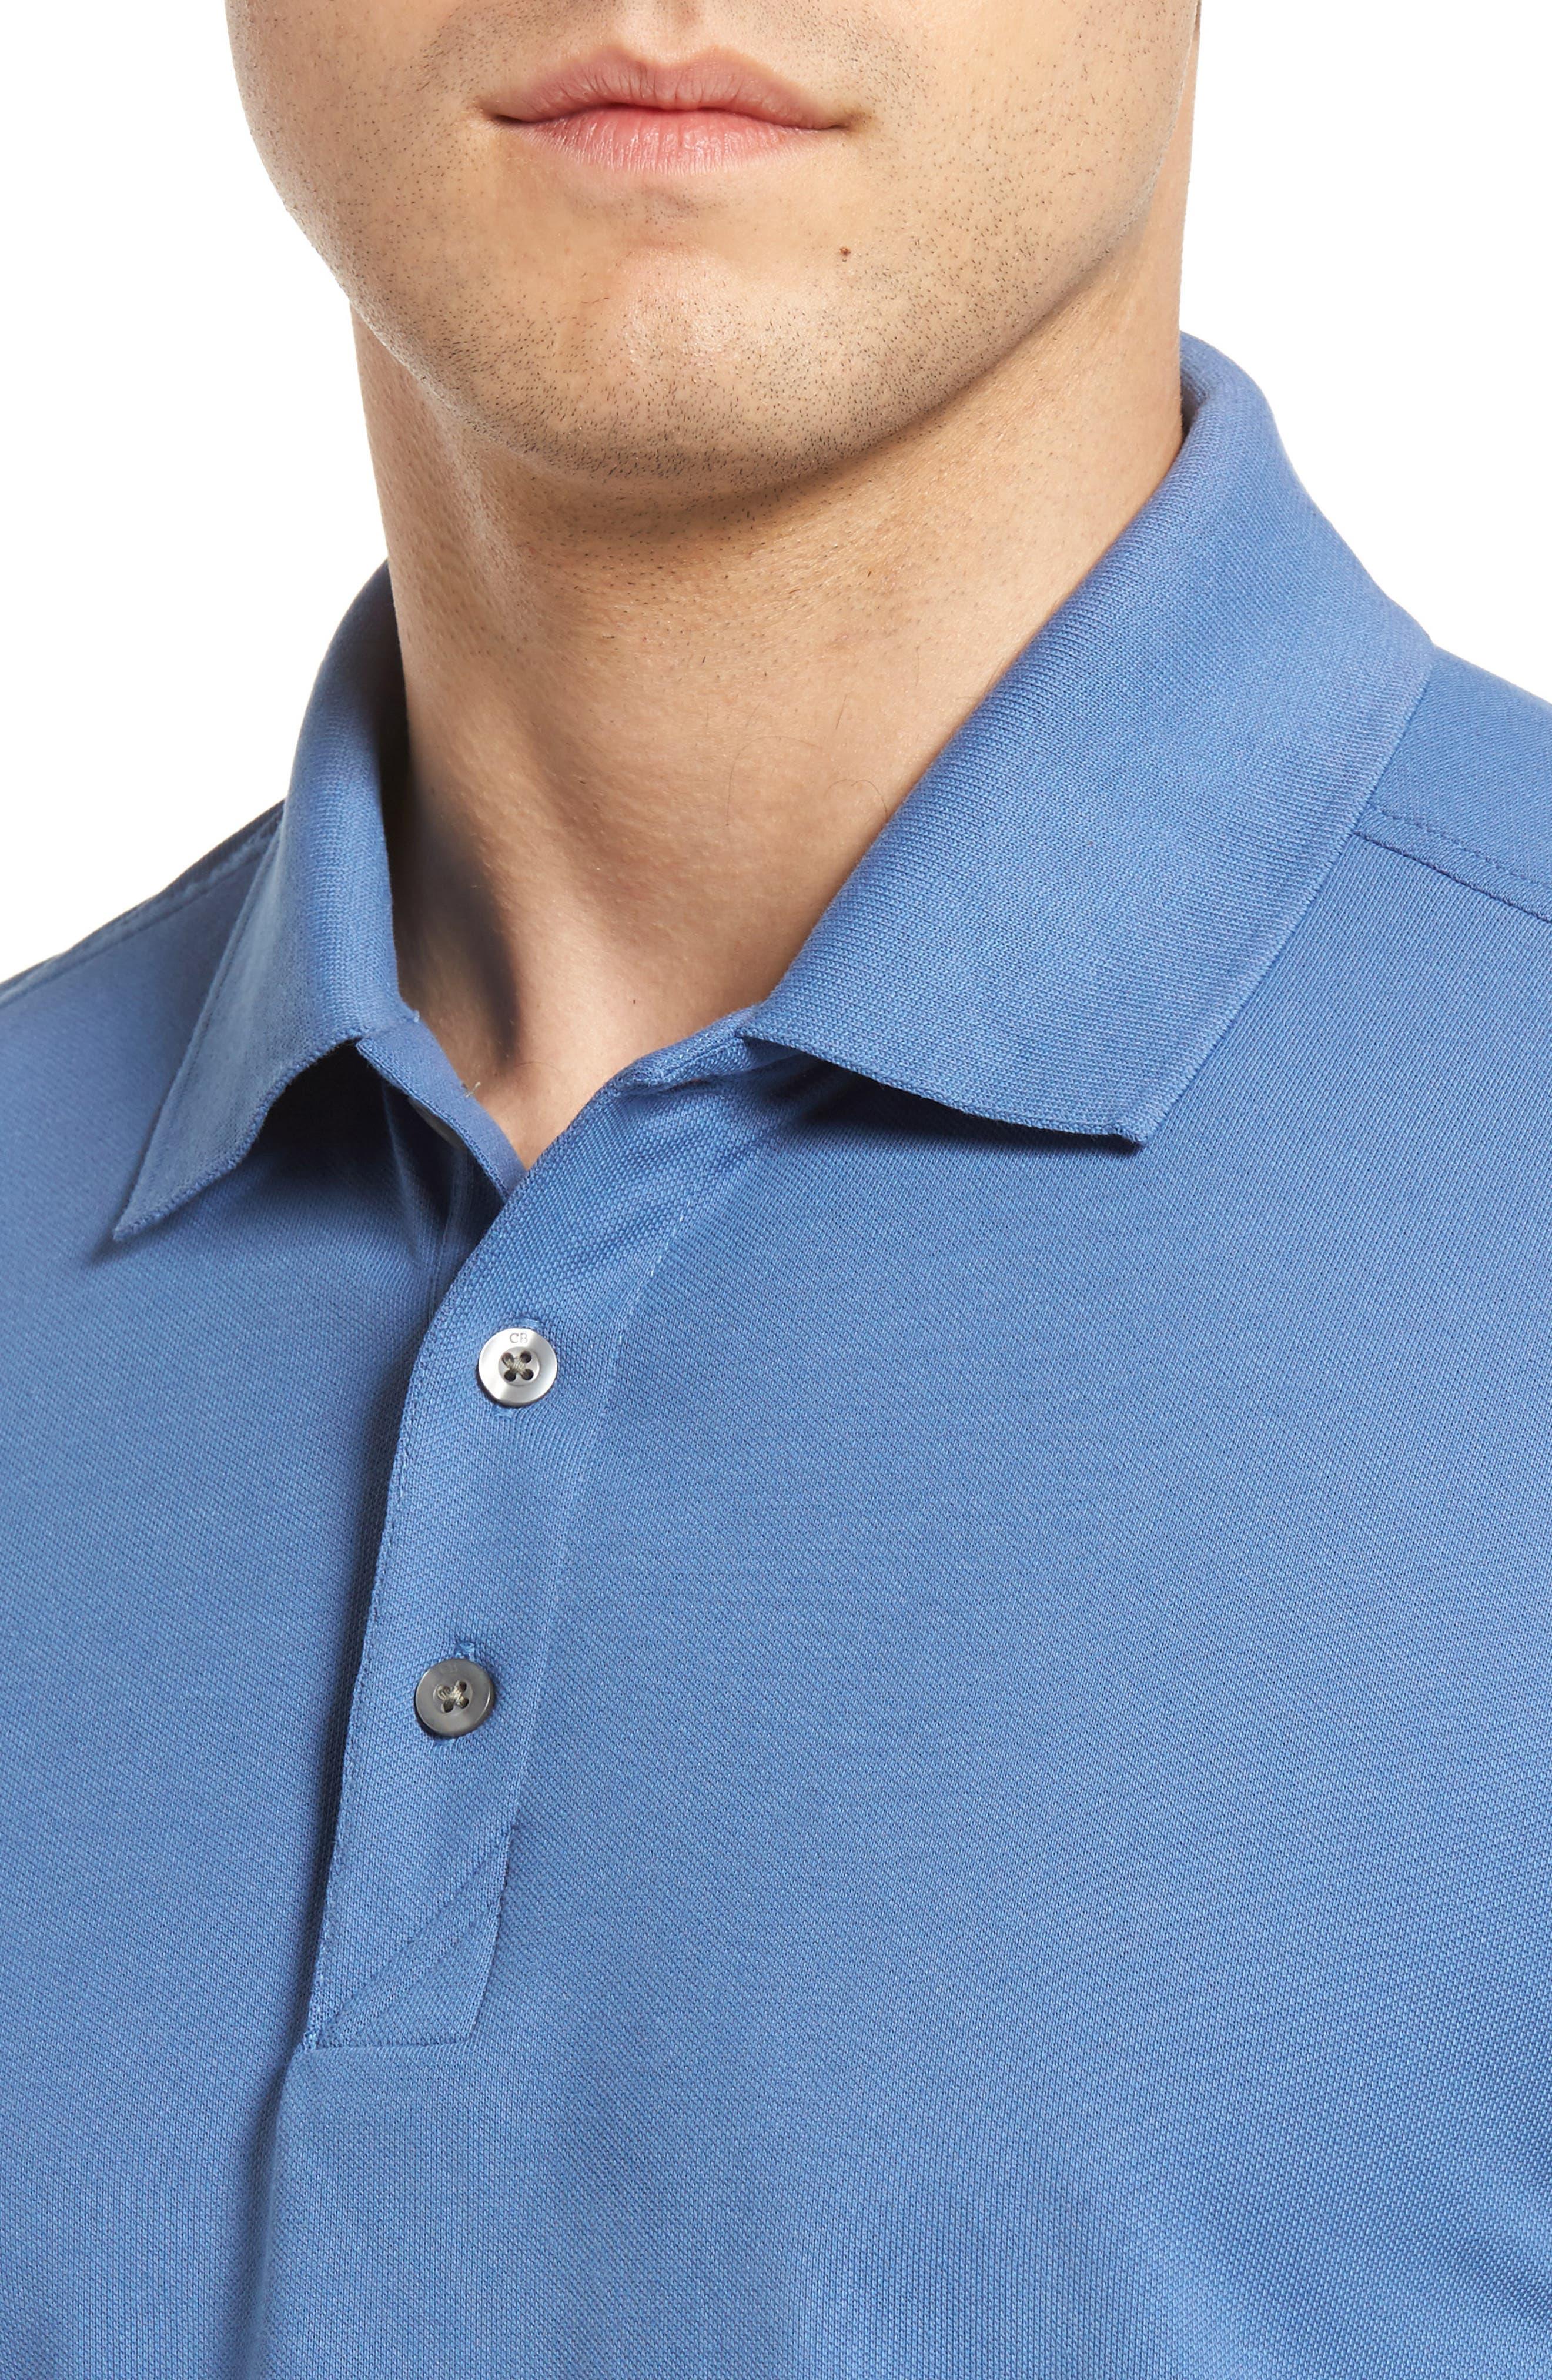 Advantage Golf Polo,                             Alternate thumbnail 4, color,                             Sea Blue